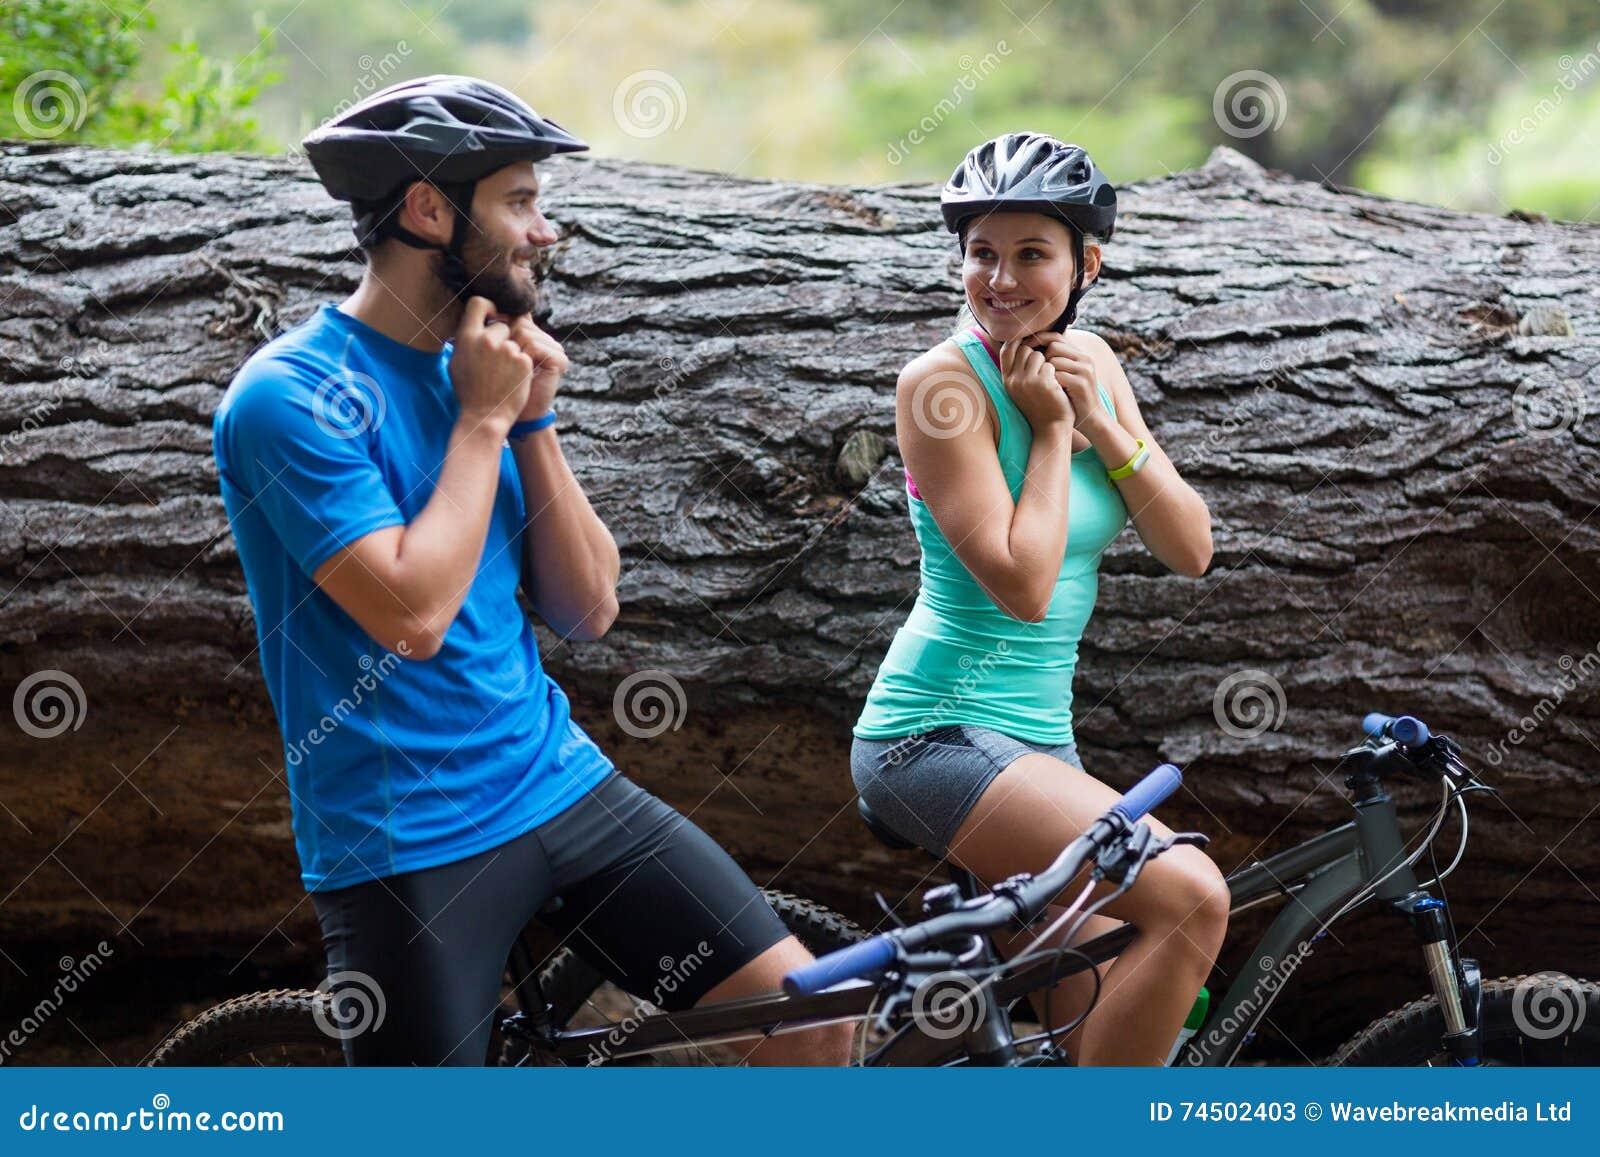 Athletic Couple Wearing Bicycle Helmet Stock Image